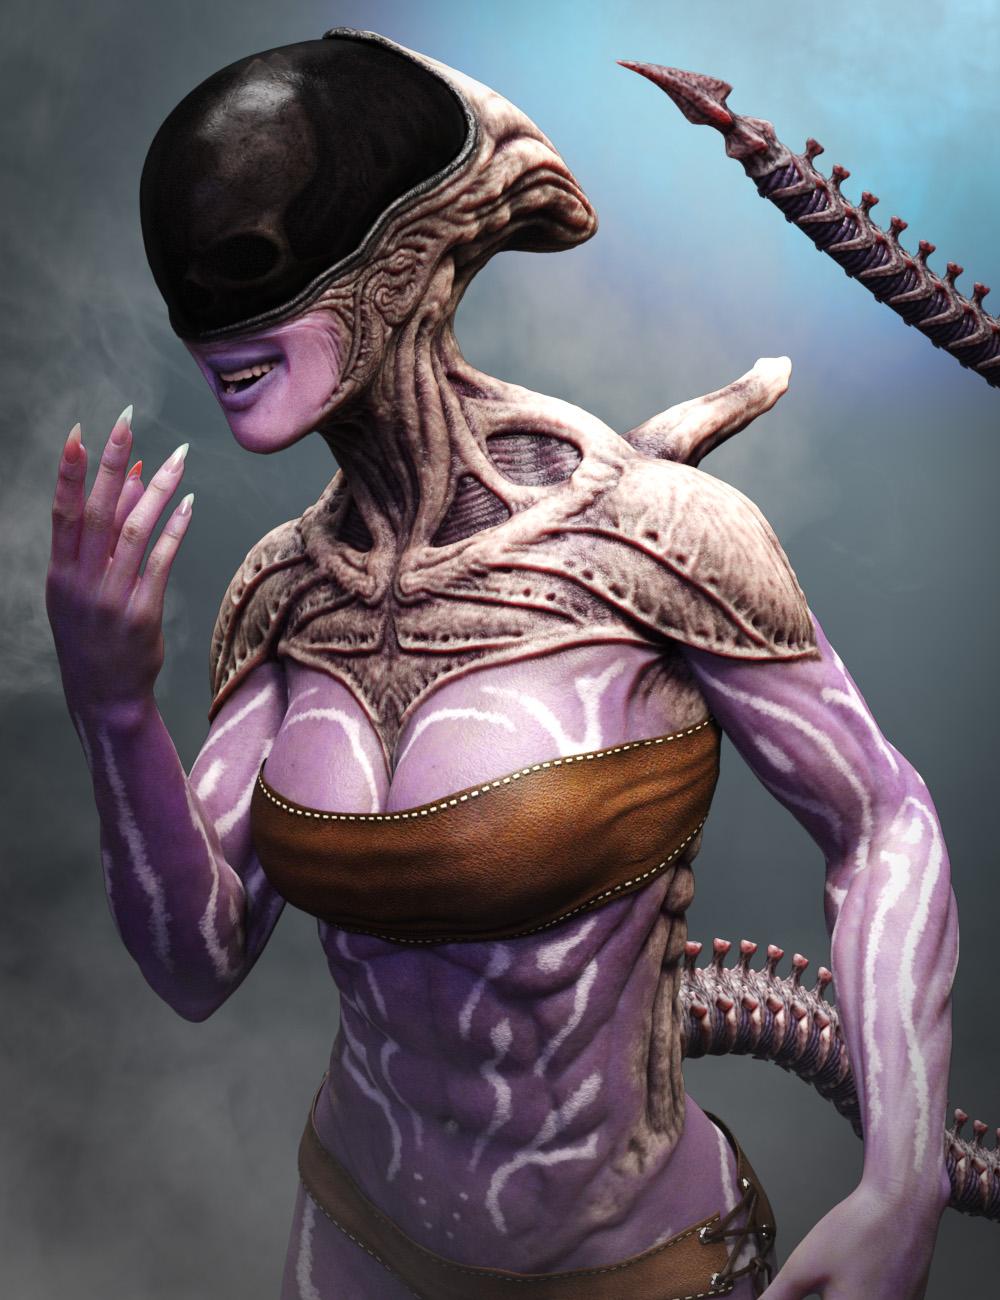 Mysterious Alien HD for Genesis 8 Female by: JoLab1985, 3D Models by Daz 3D